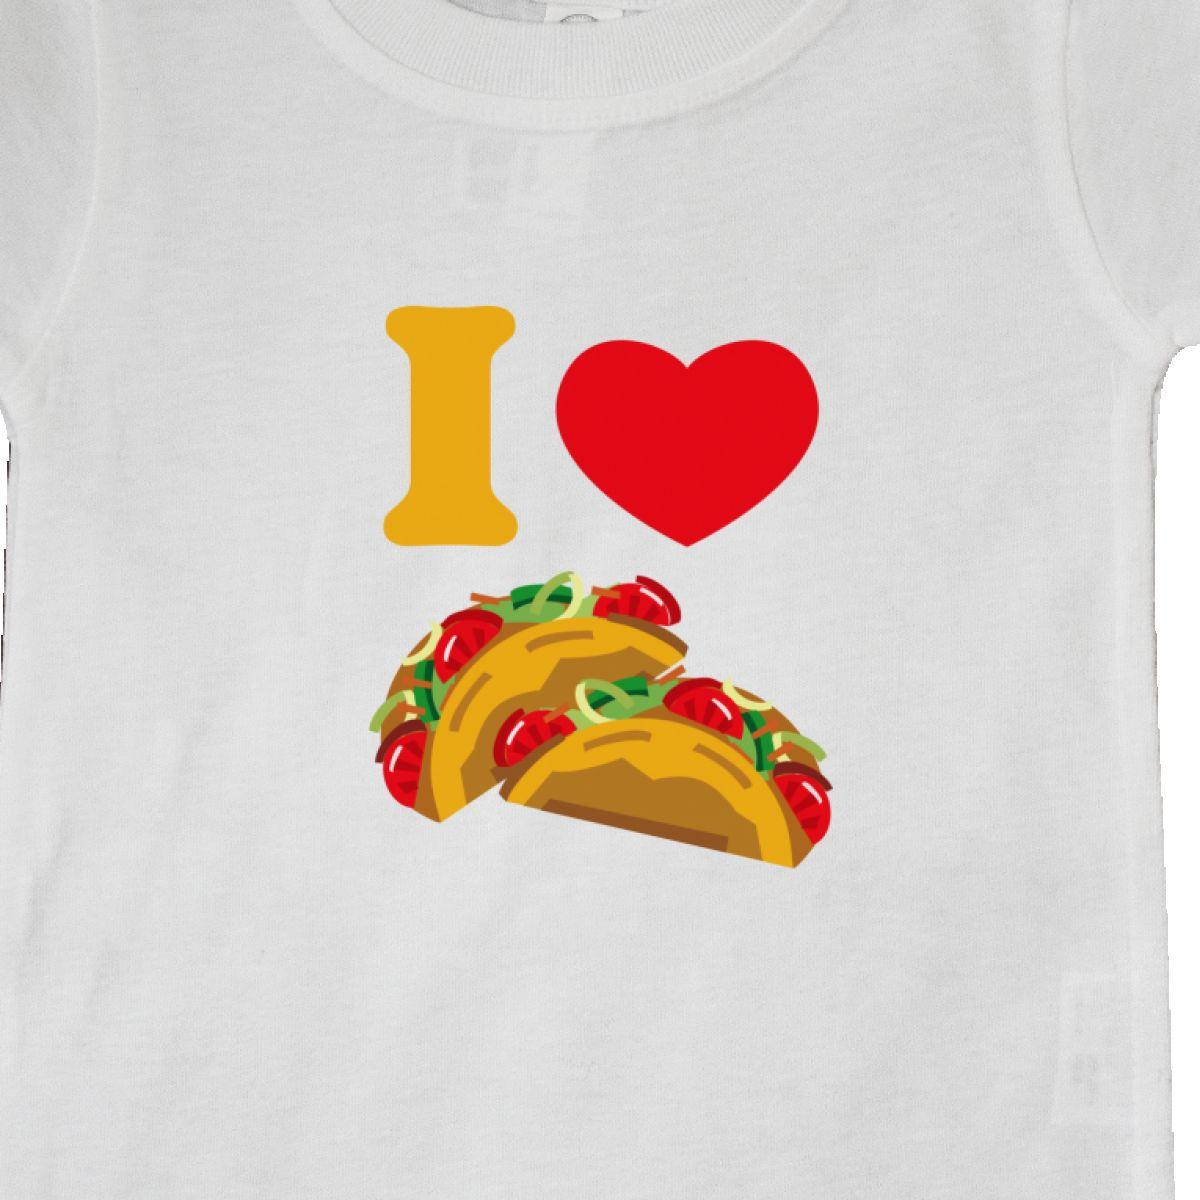 c4480bec Inktastic I Love Tacos Baby T-Shirt Heart Taco Mexican Food ...